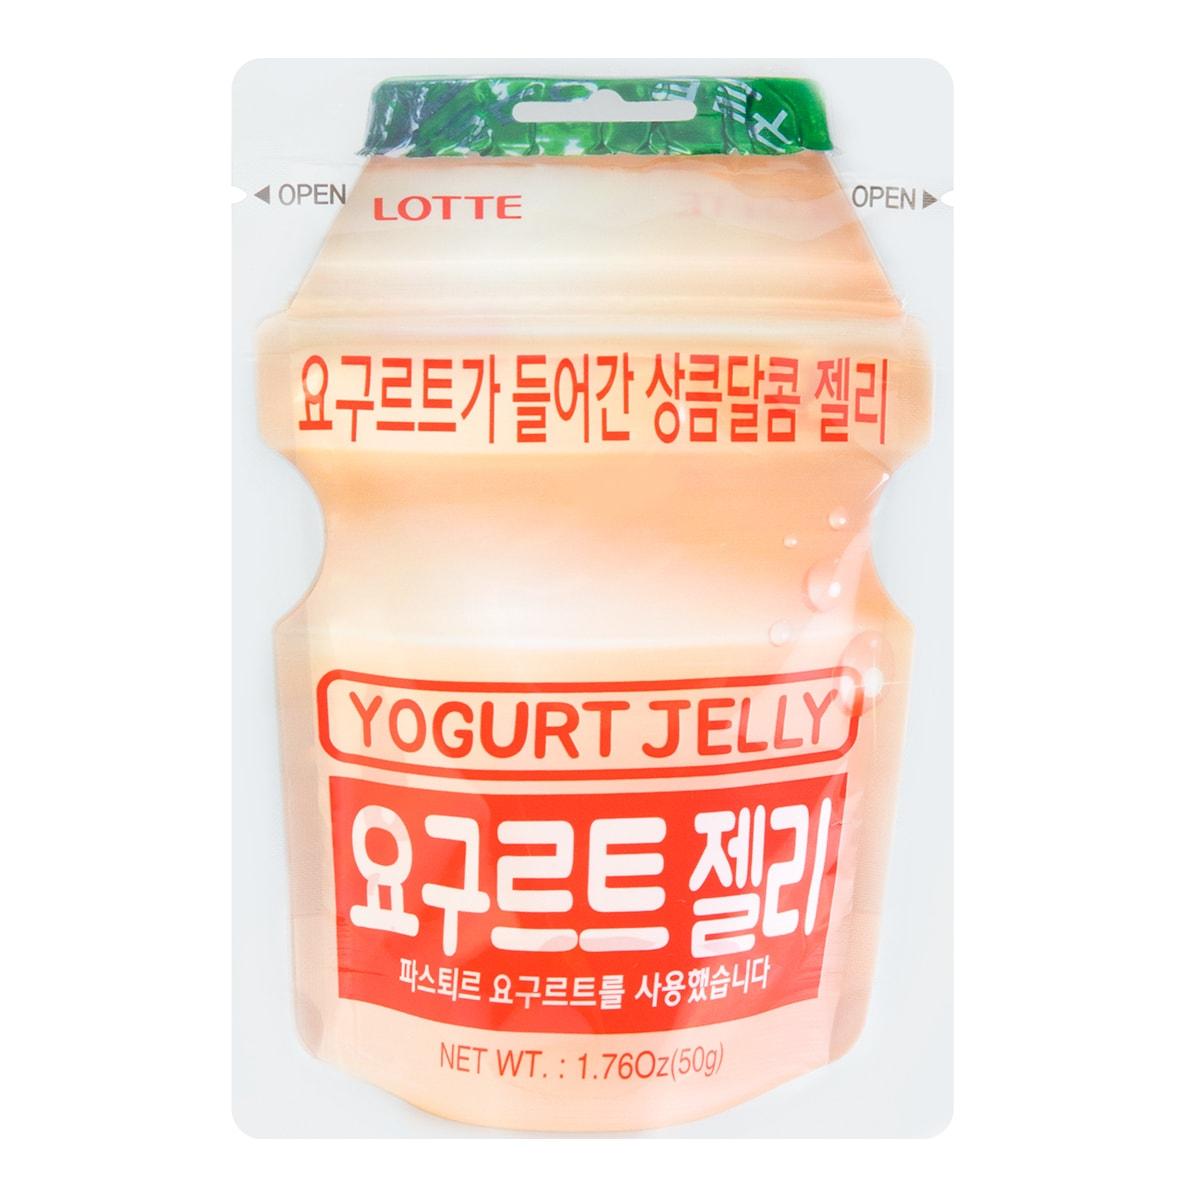 LOTTE Yogurt Jelly 50g